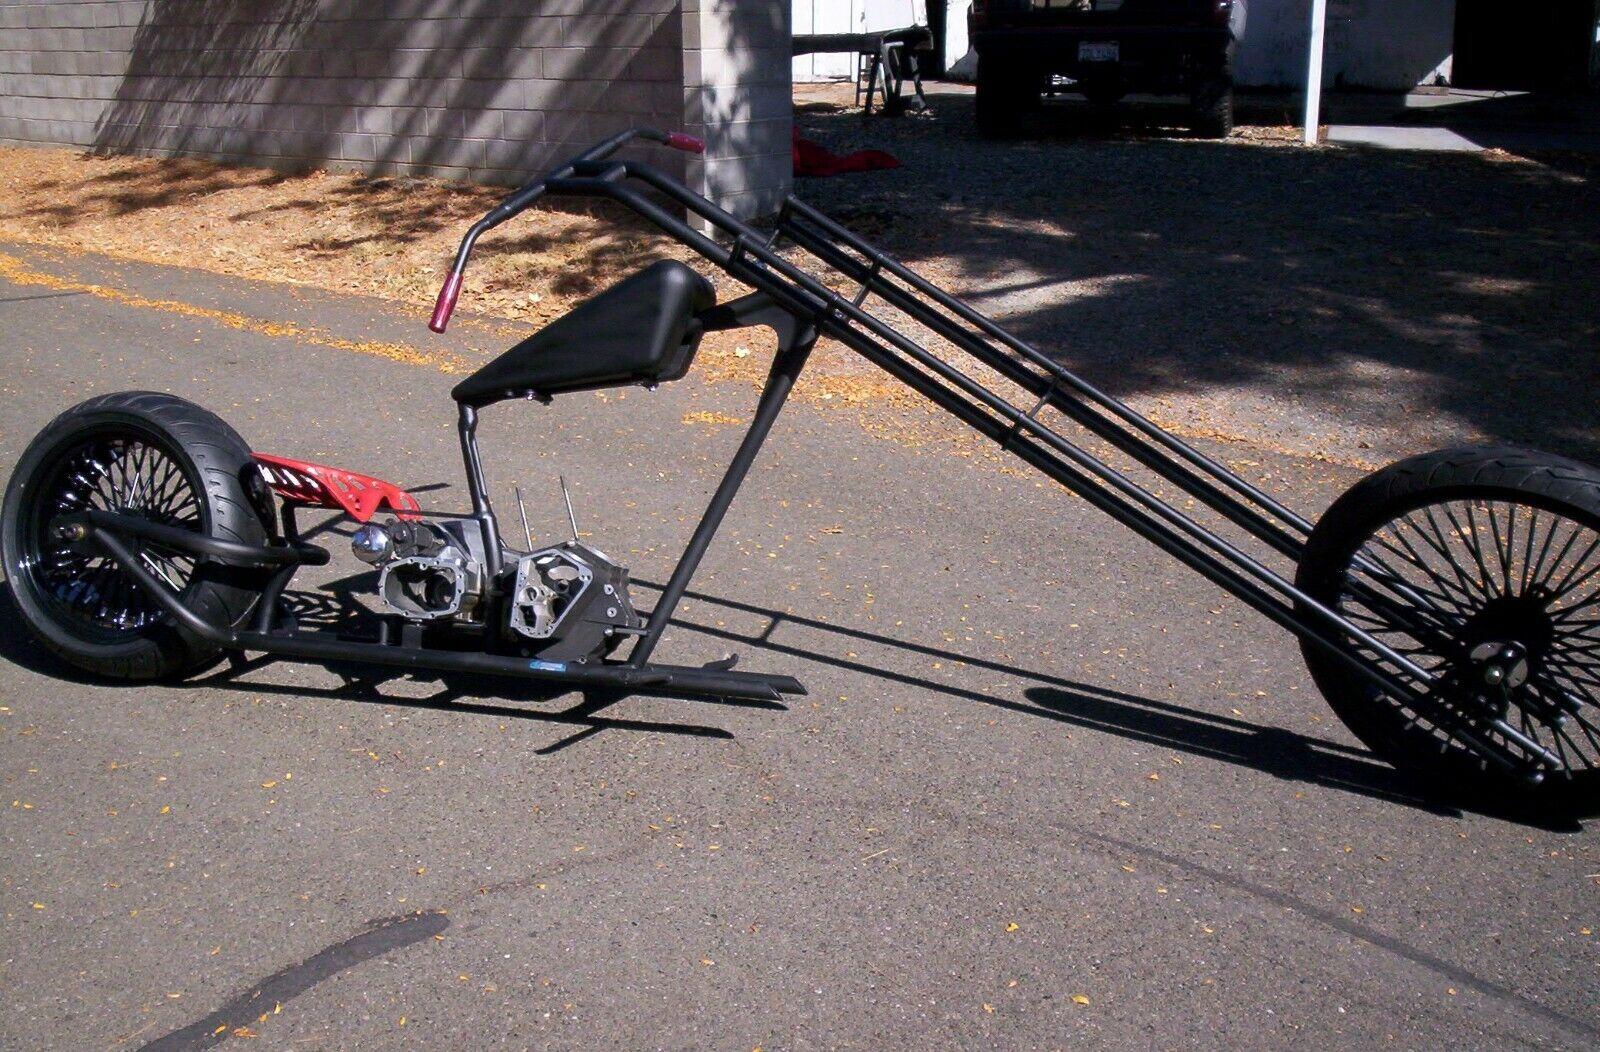 New 2020 chopper project bike.